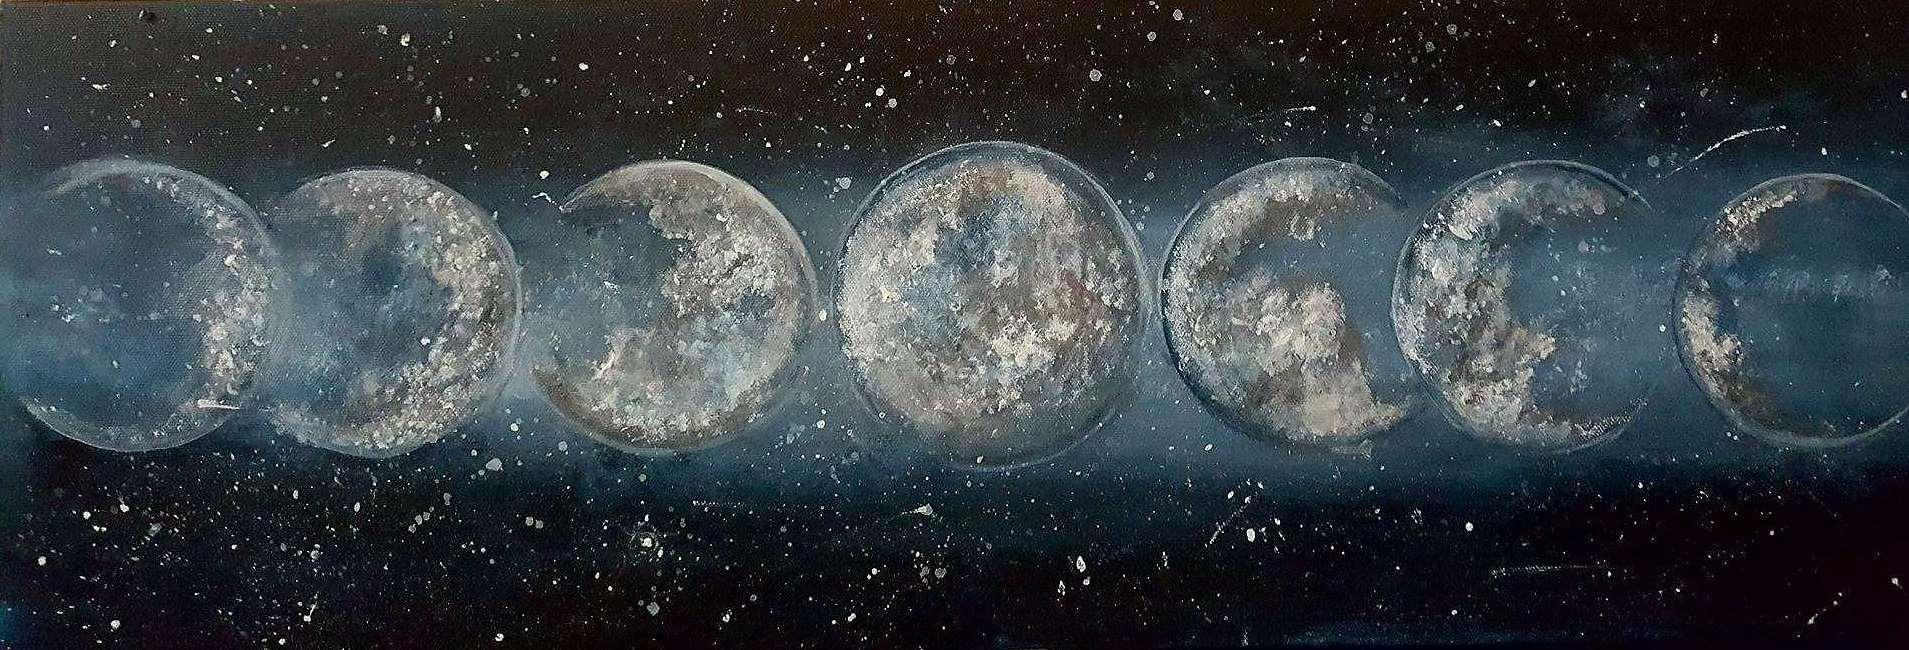 Moondancing